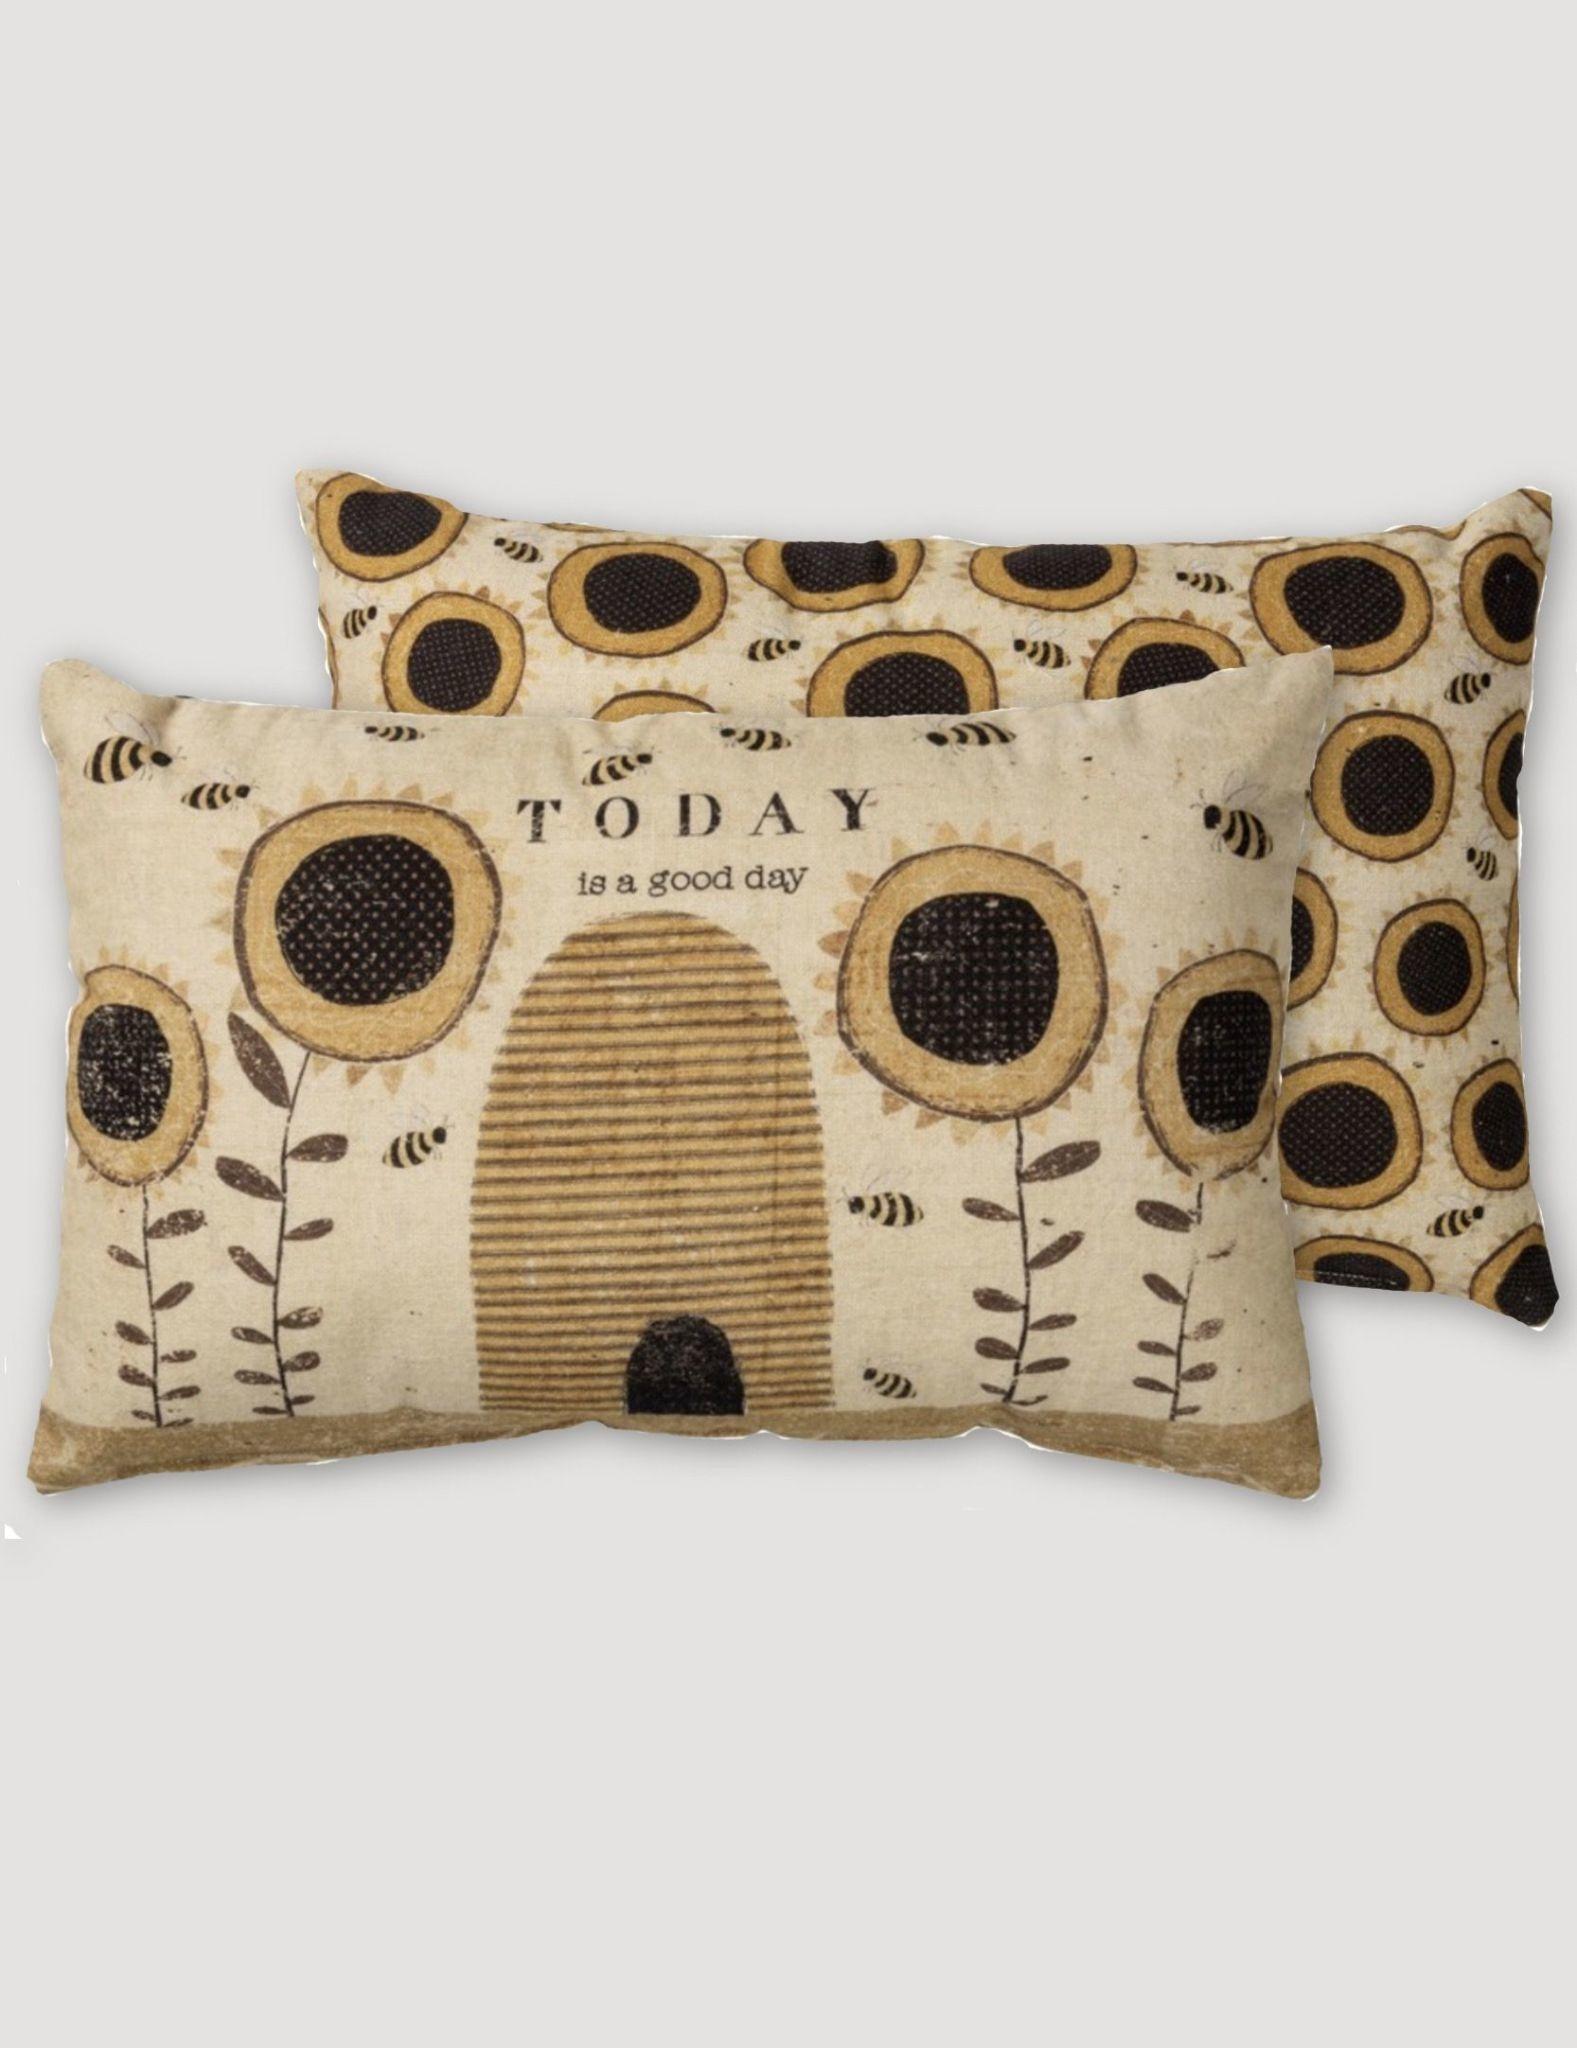 Nana's Farmhouse Today Is A Good Day Pillow